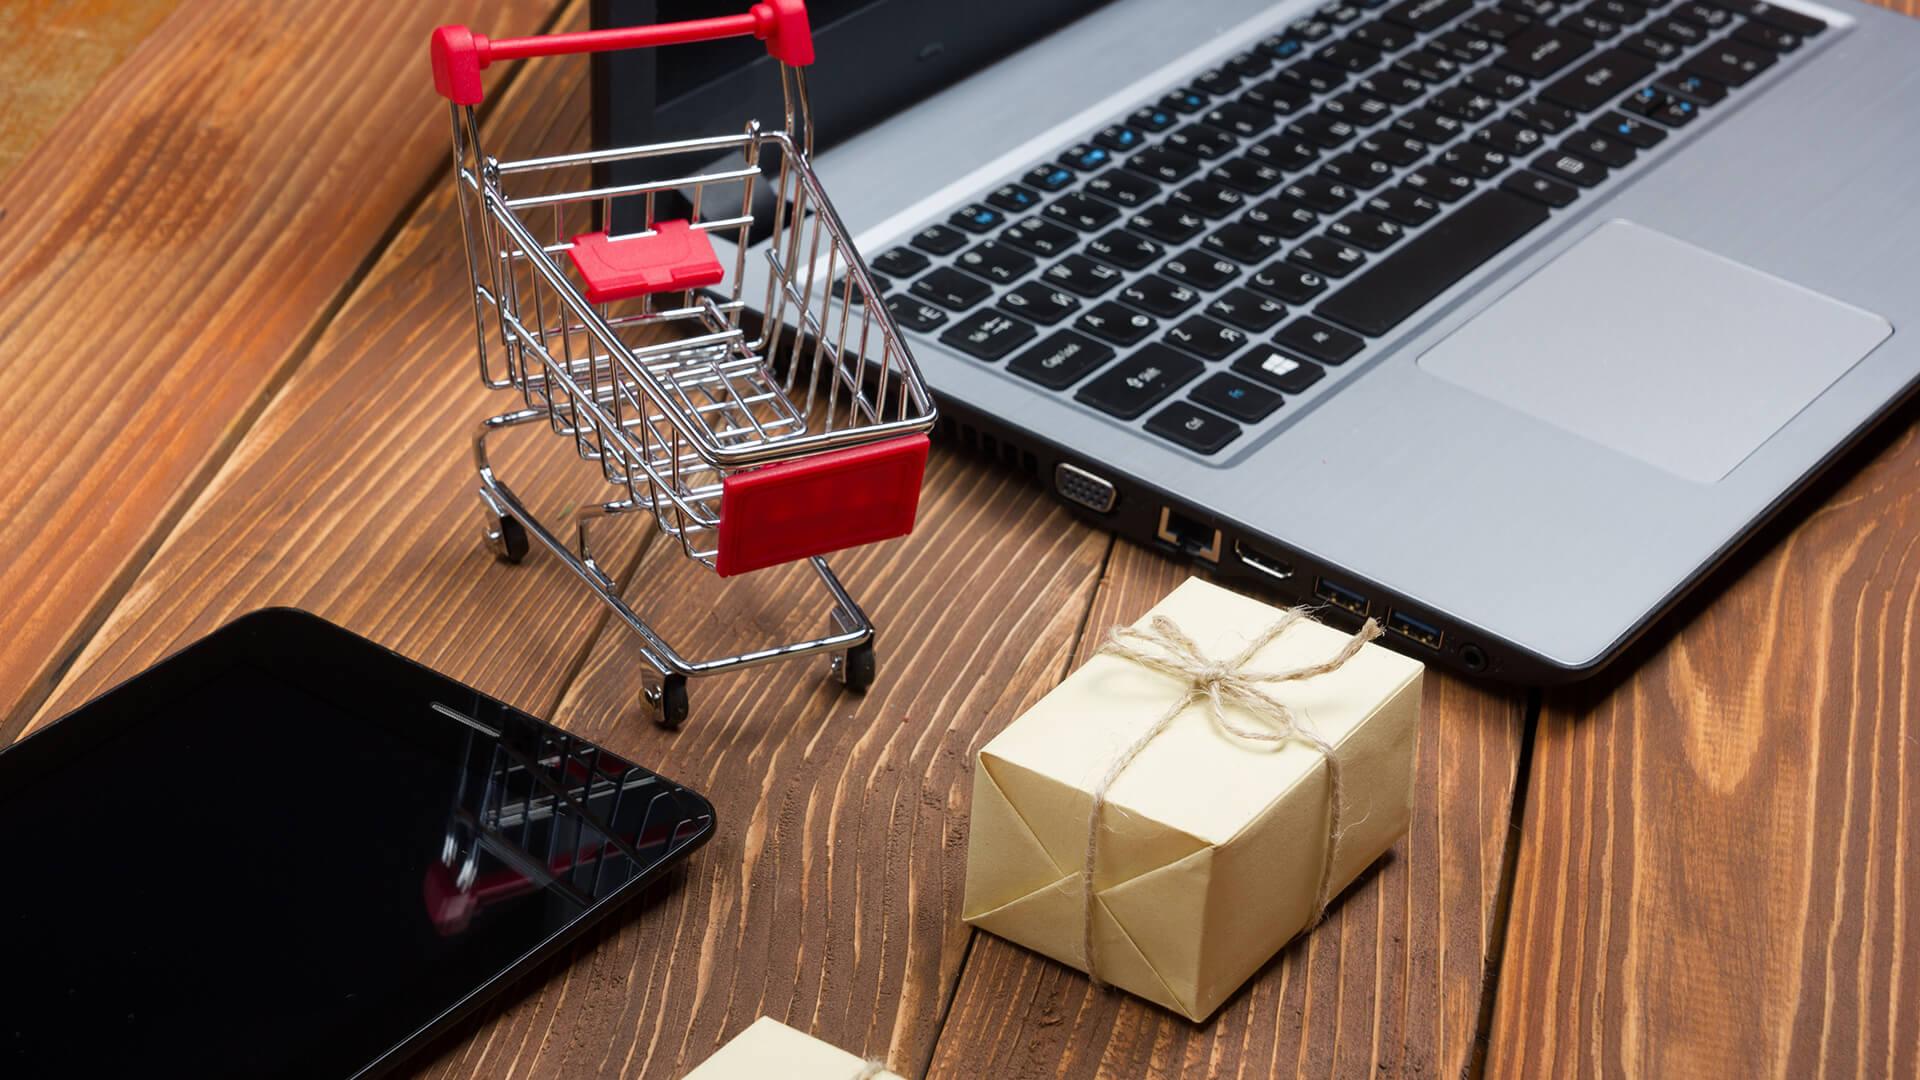 Accompagnement et conseils en webmarketing : black Friday et cyber Monday – k4tegori